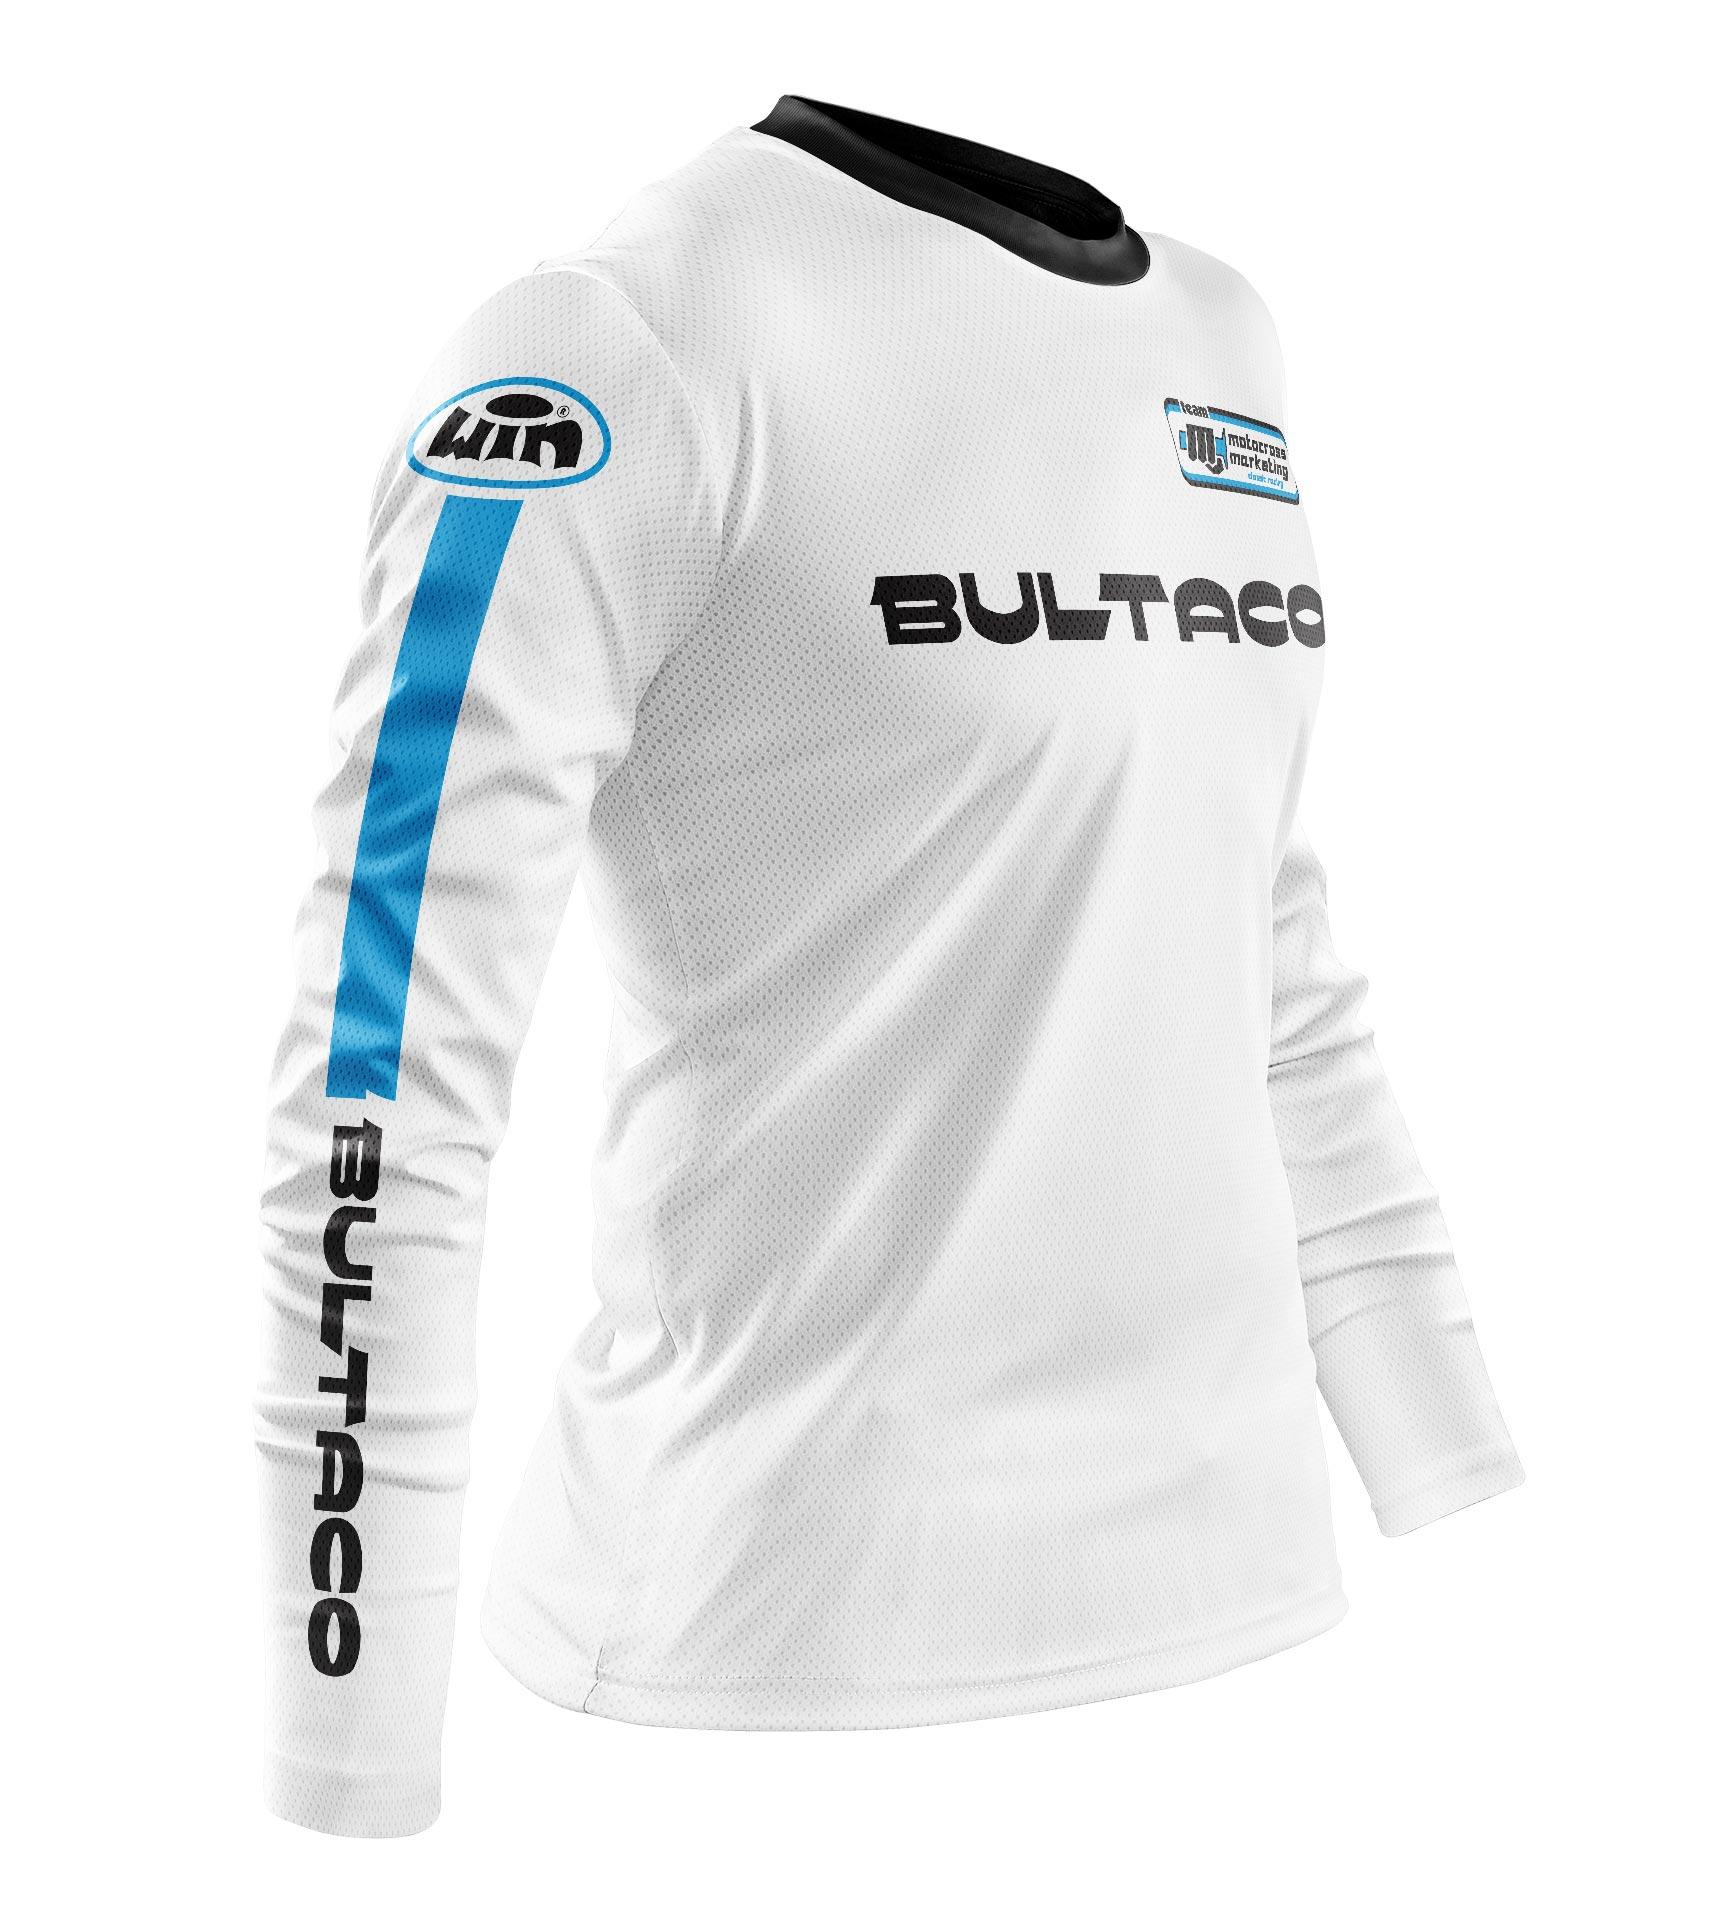 Maillot BULTACO Aéré Blanc Hi Profil